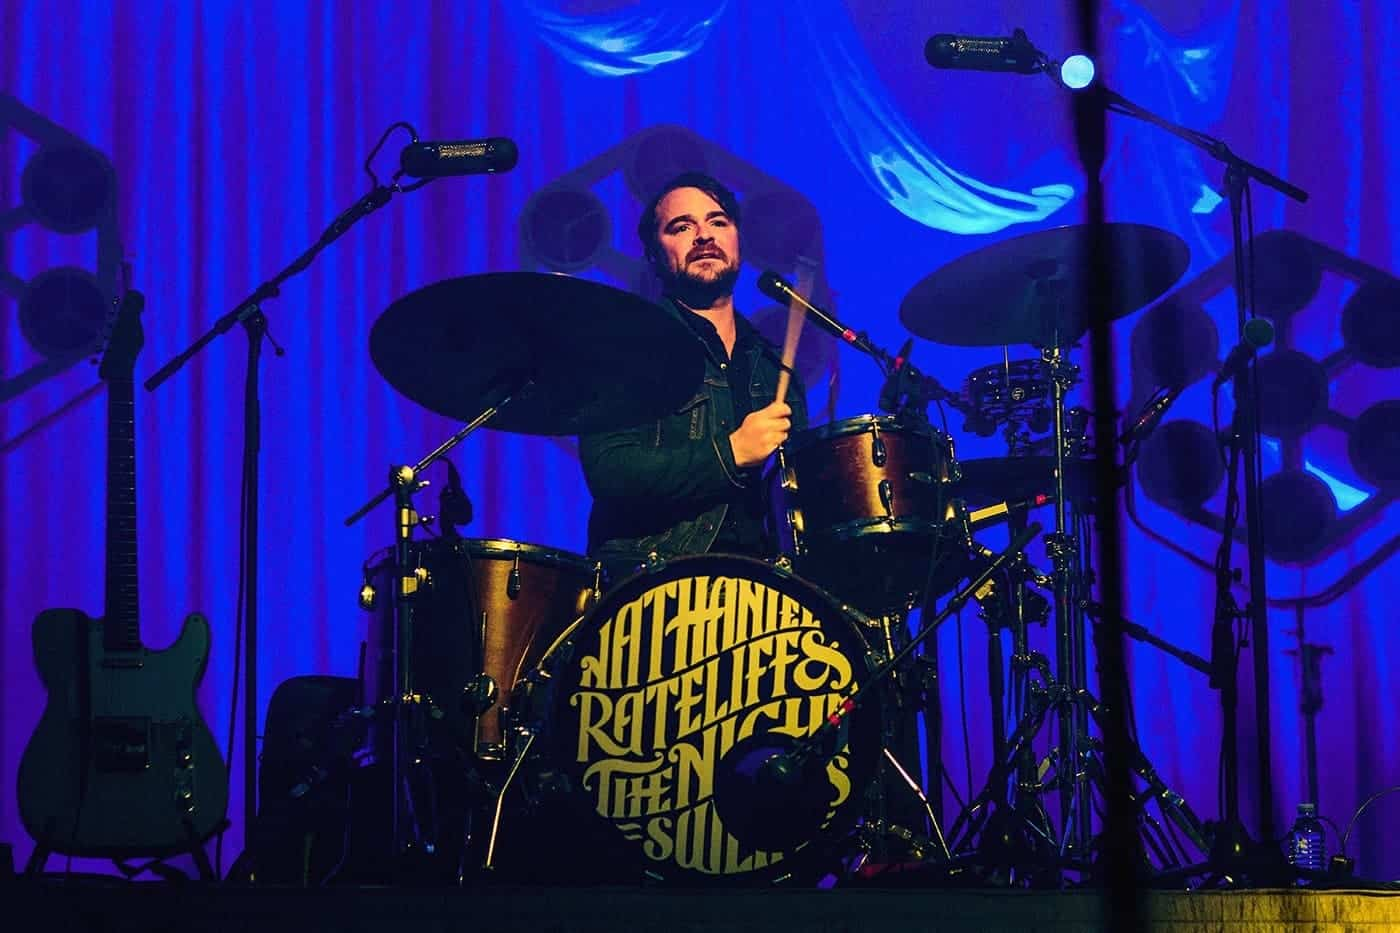 Nathaniel Rateliff & the Night Sweats drummer